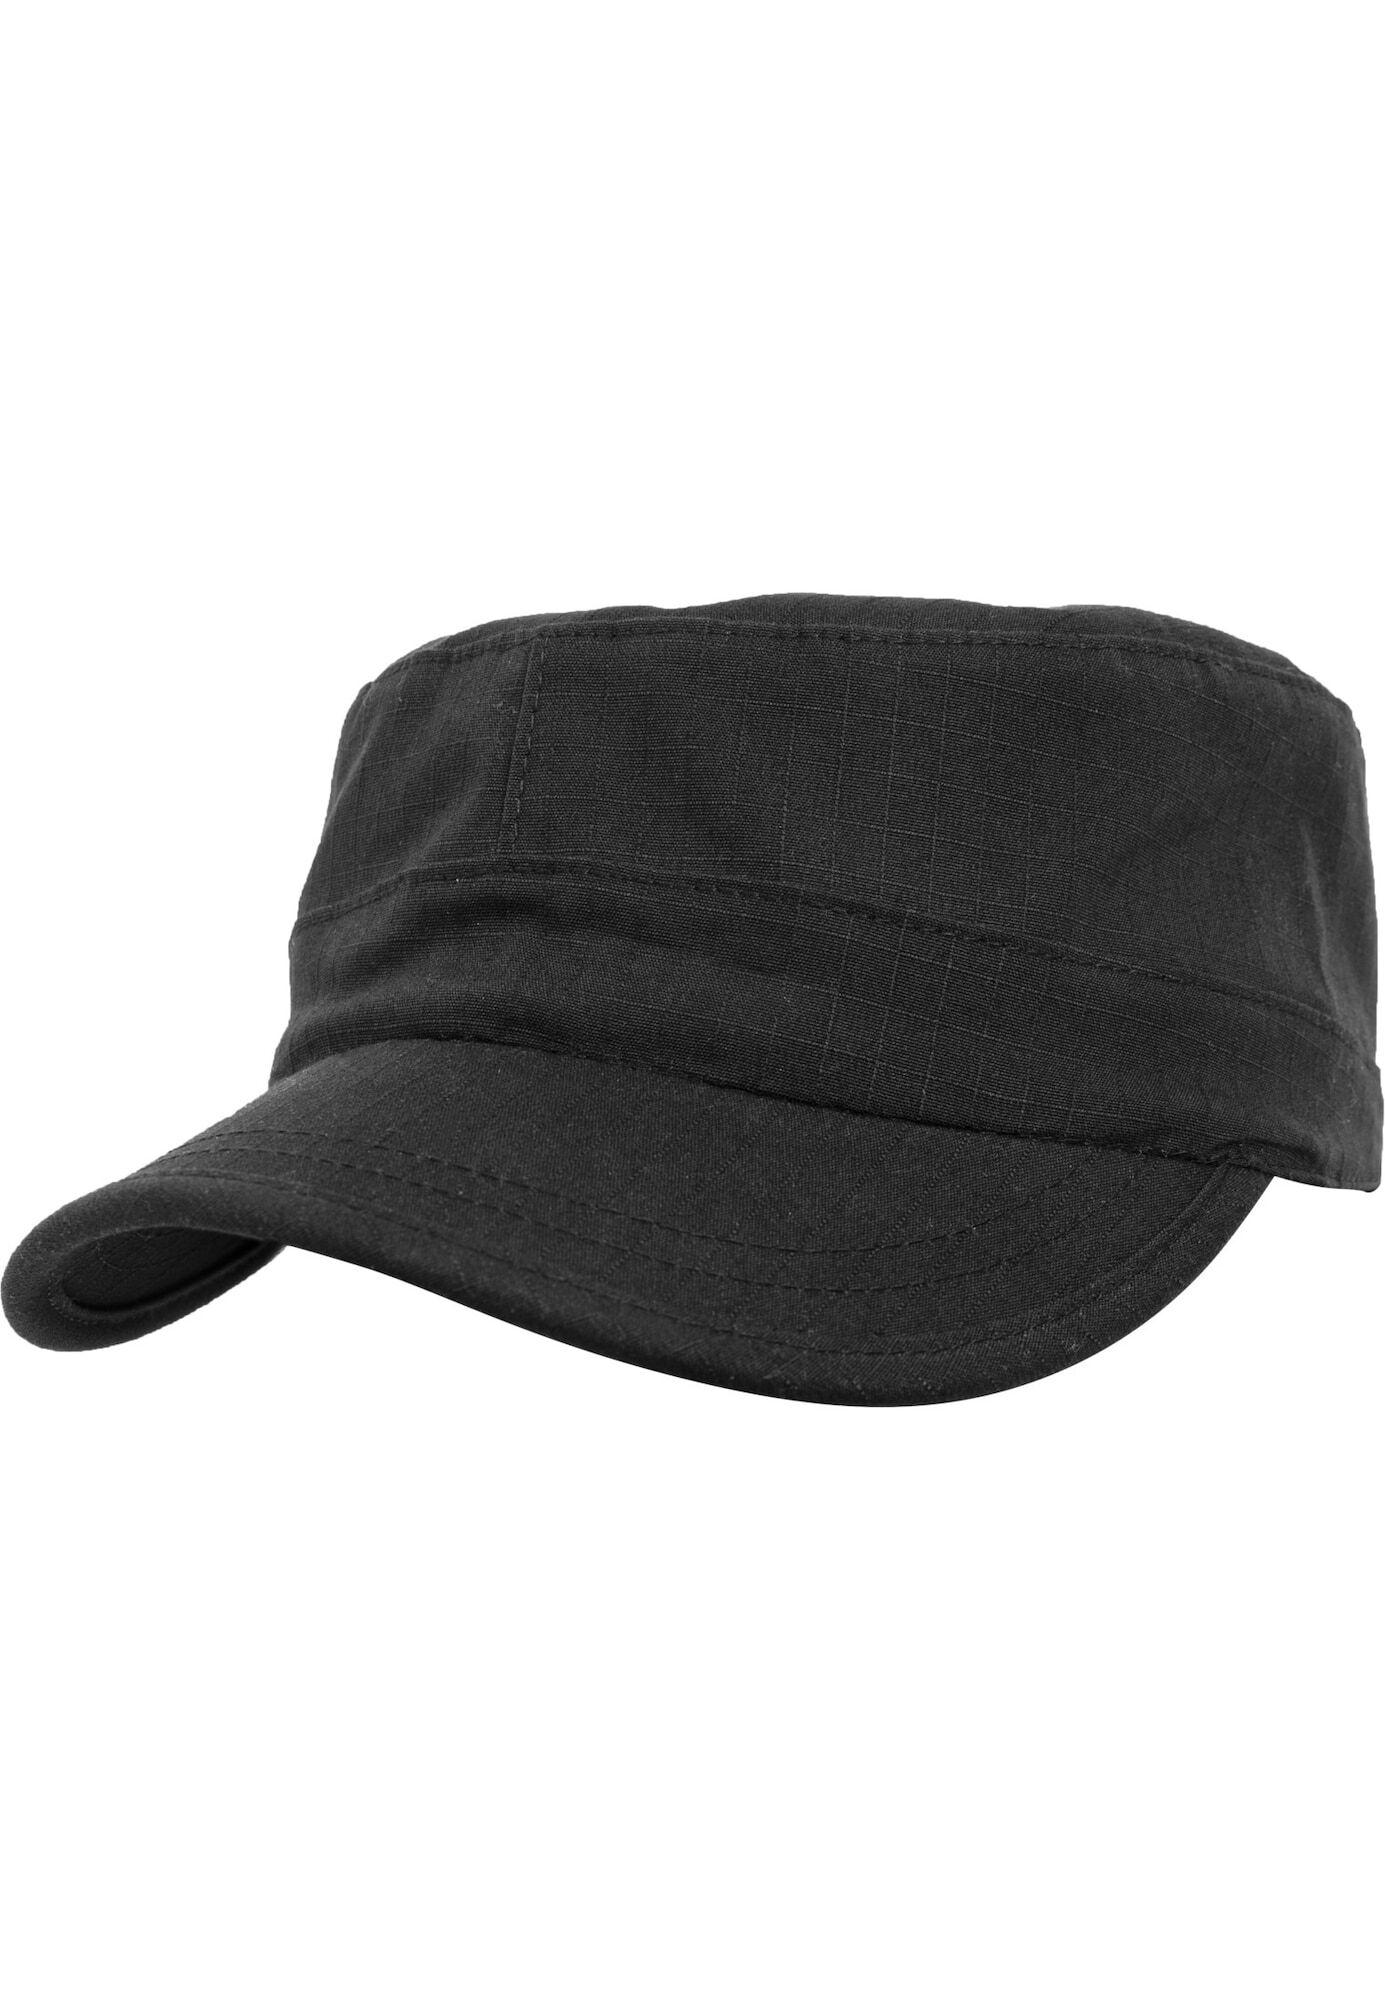 Flexfit Cappello da baseball 'Top Gun Ripstop' Nero